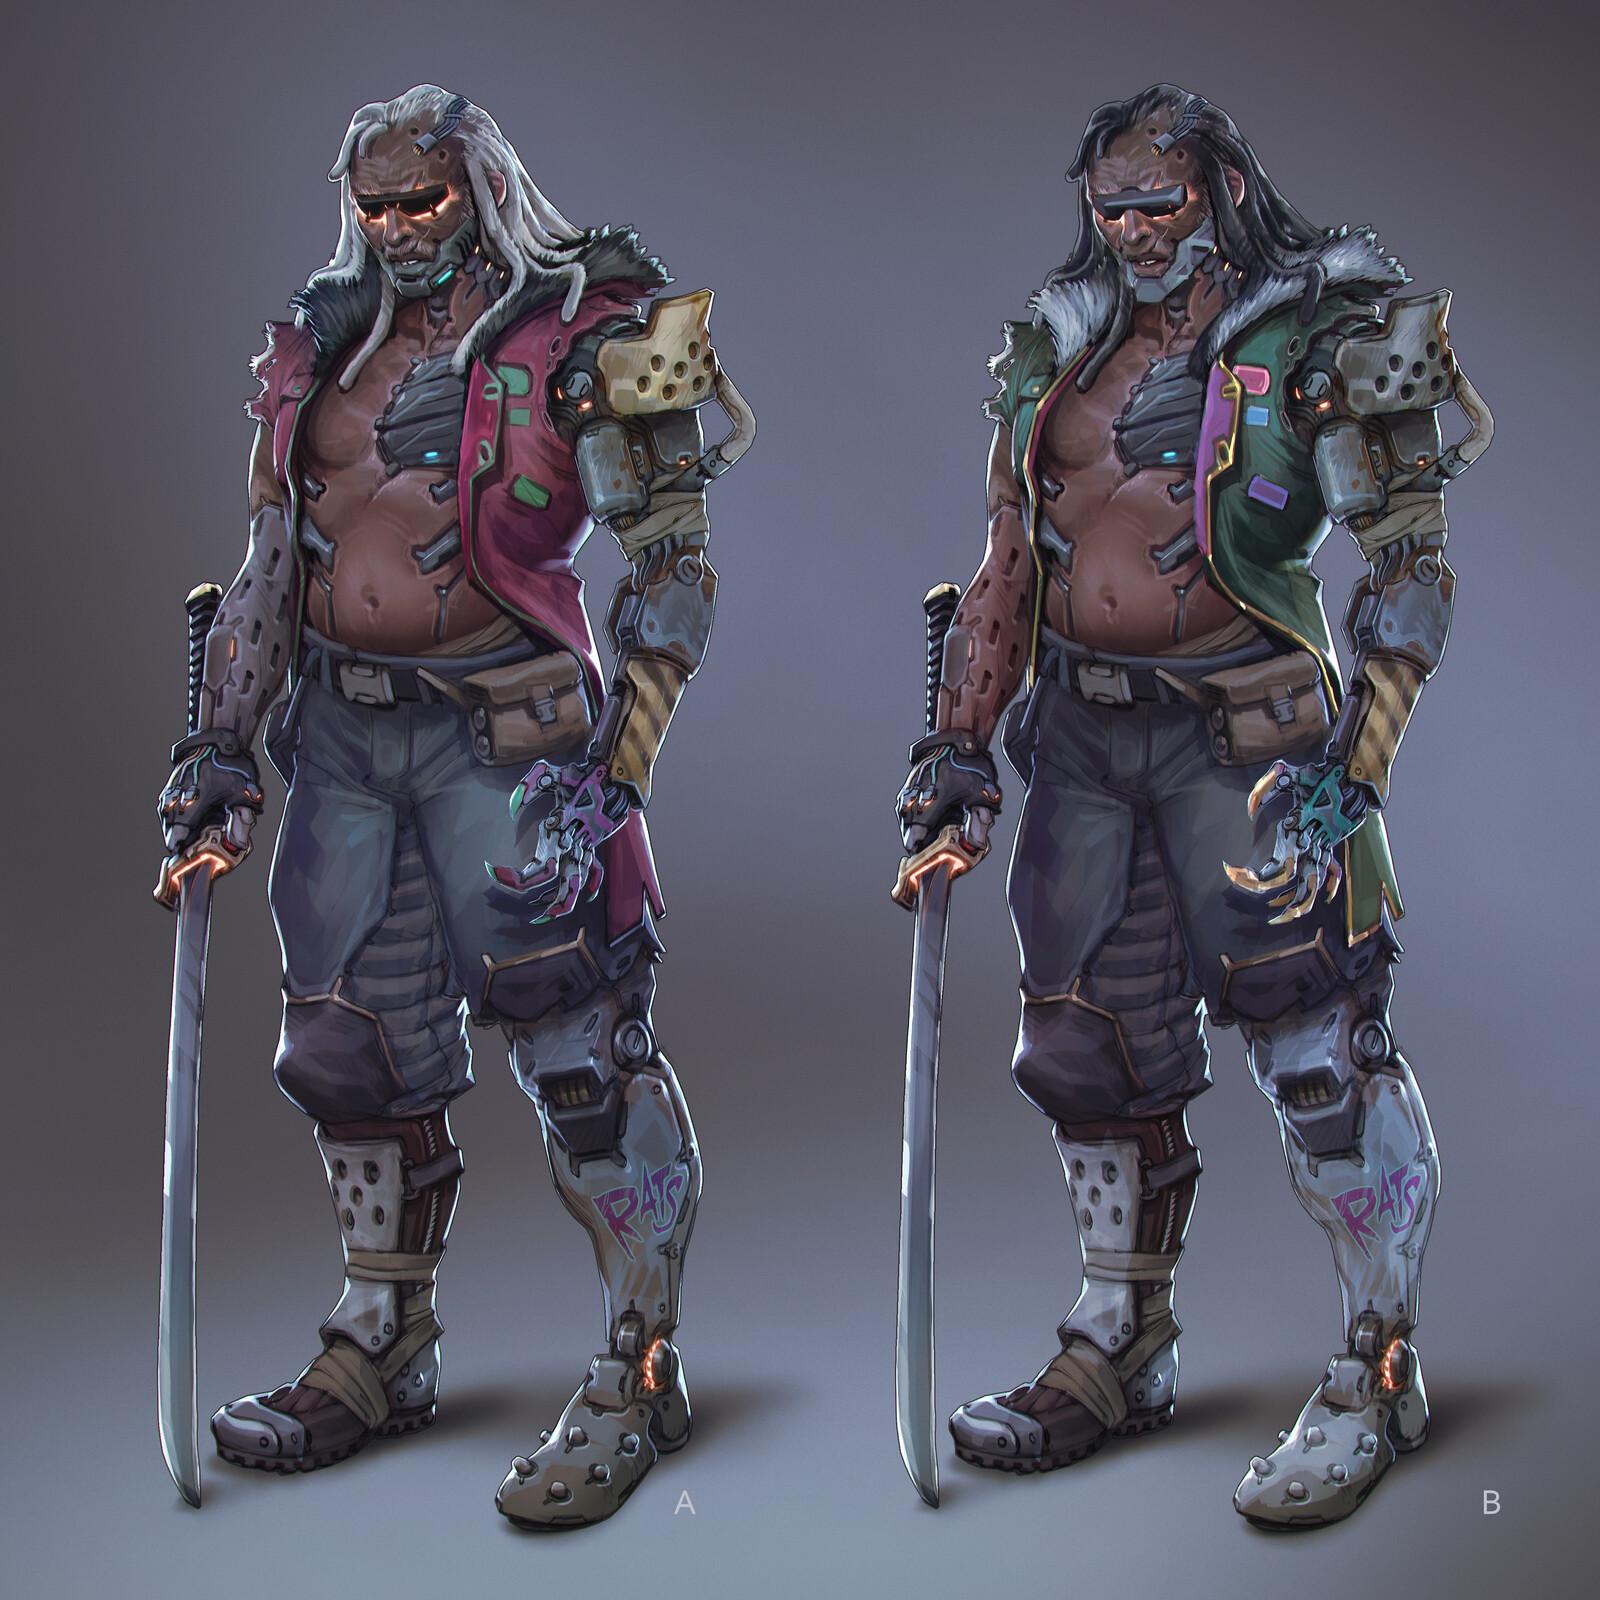 Rat King, Cyberpunk 2077 challenge on digital painitng school.